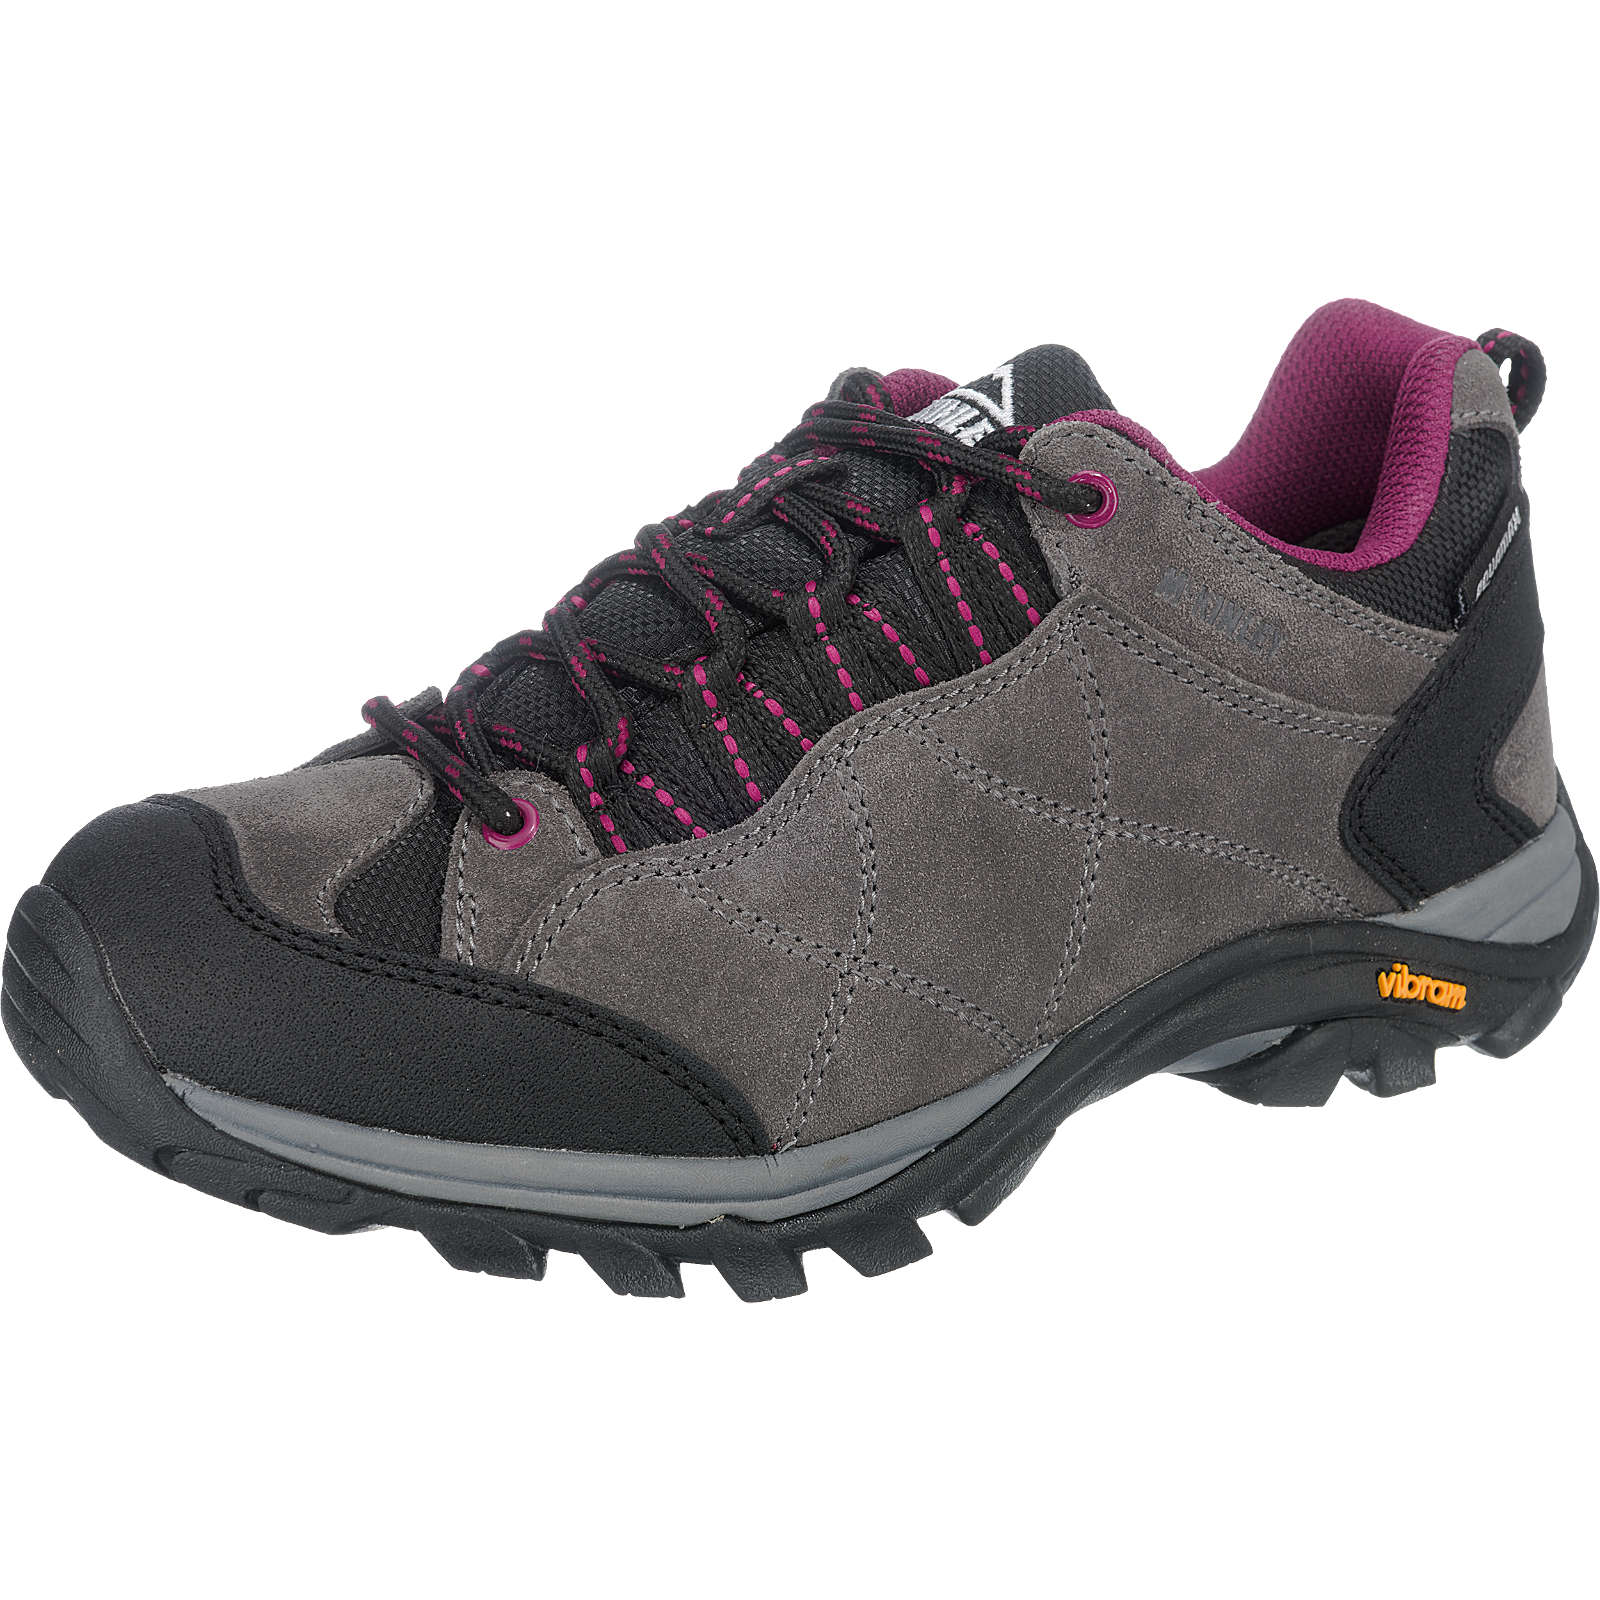 McKinley Nago Aqx Outdoor Schuhe wasserdicht grau-kombi Damen Gr. 40